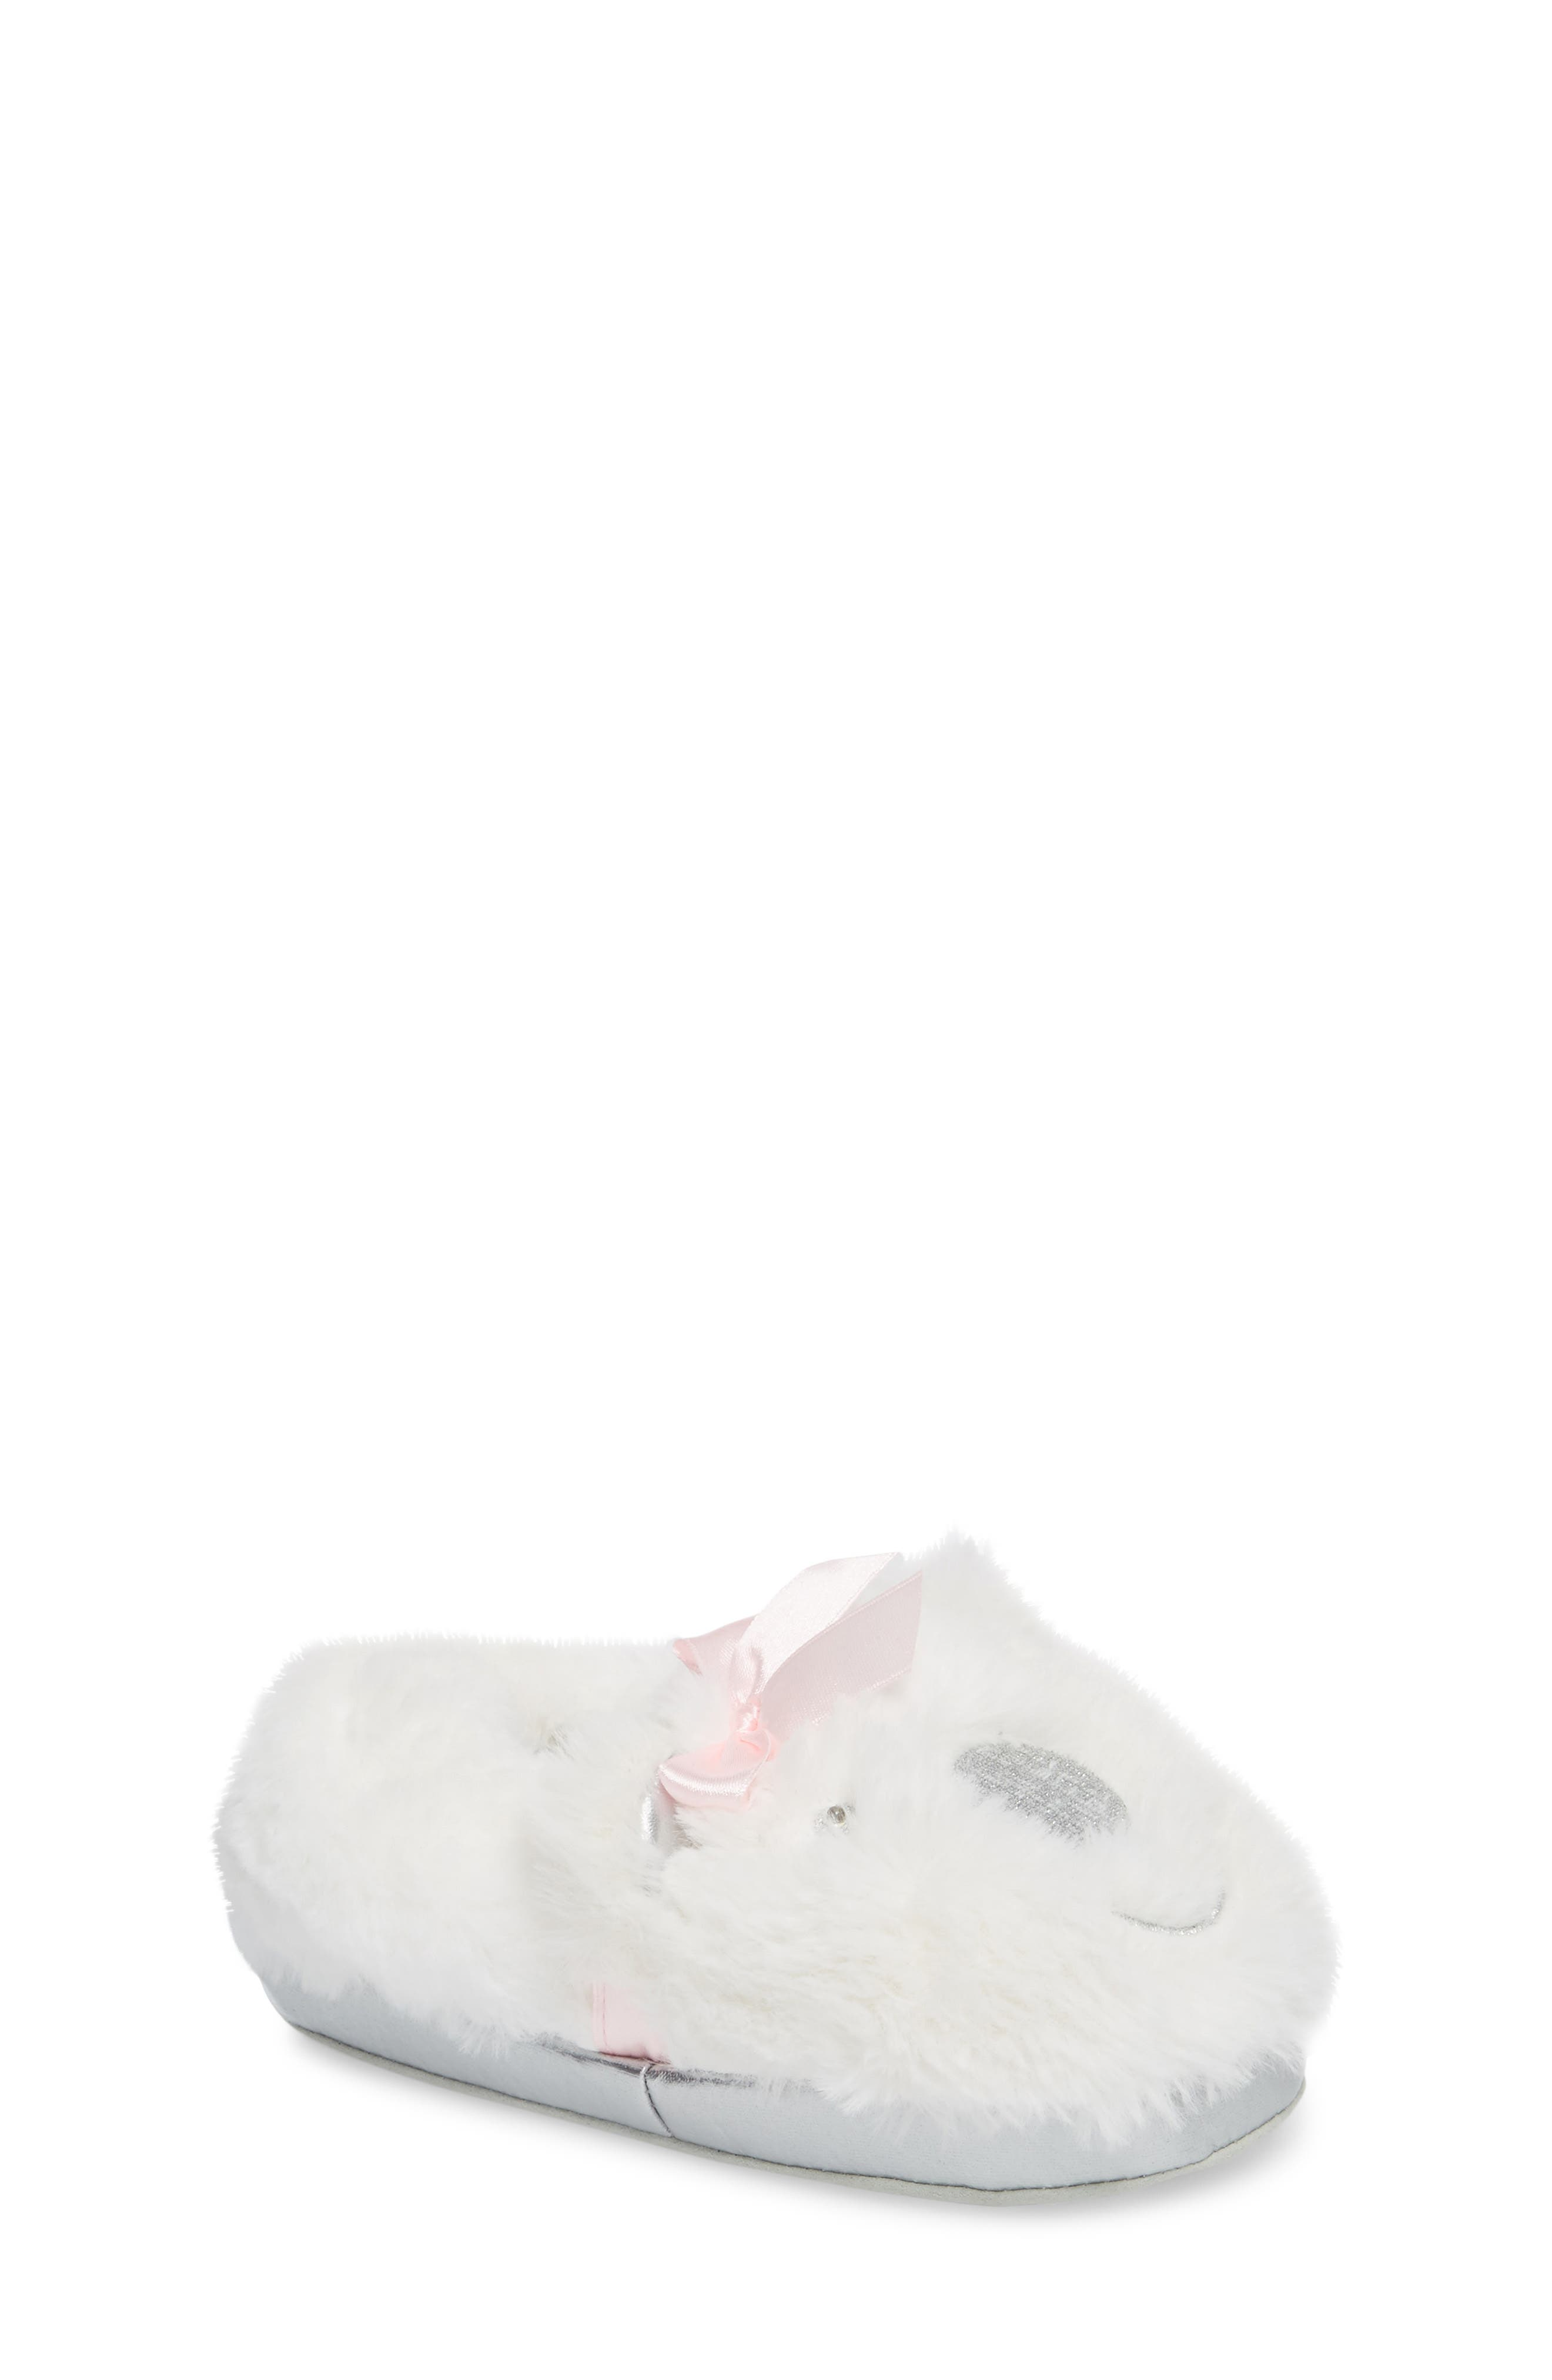 Main Image - Trimfit Light-Up Faux Fur Polar Bear Slipper (Toddler & Little Kid)